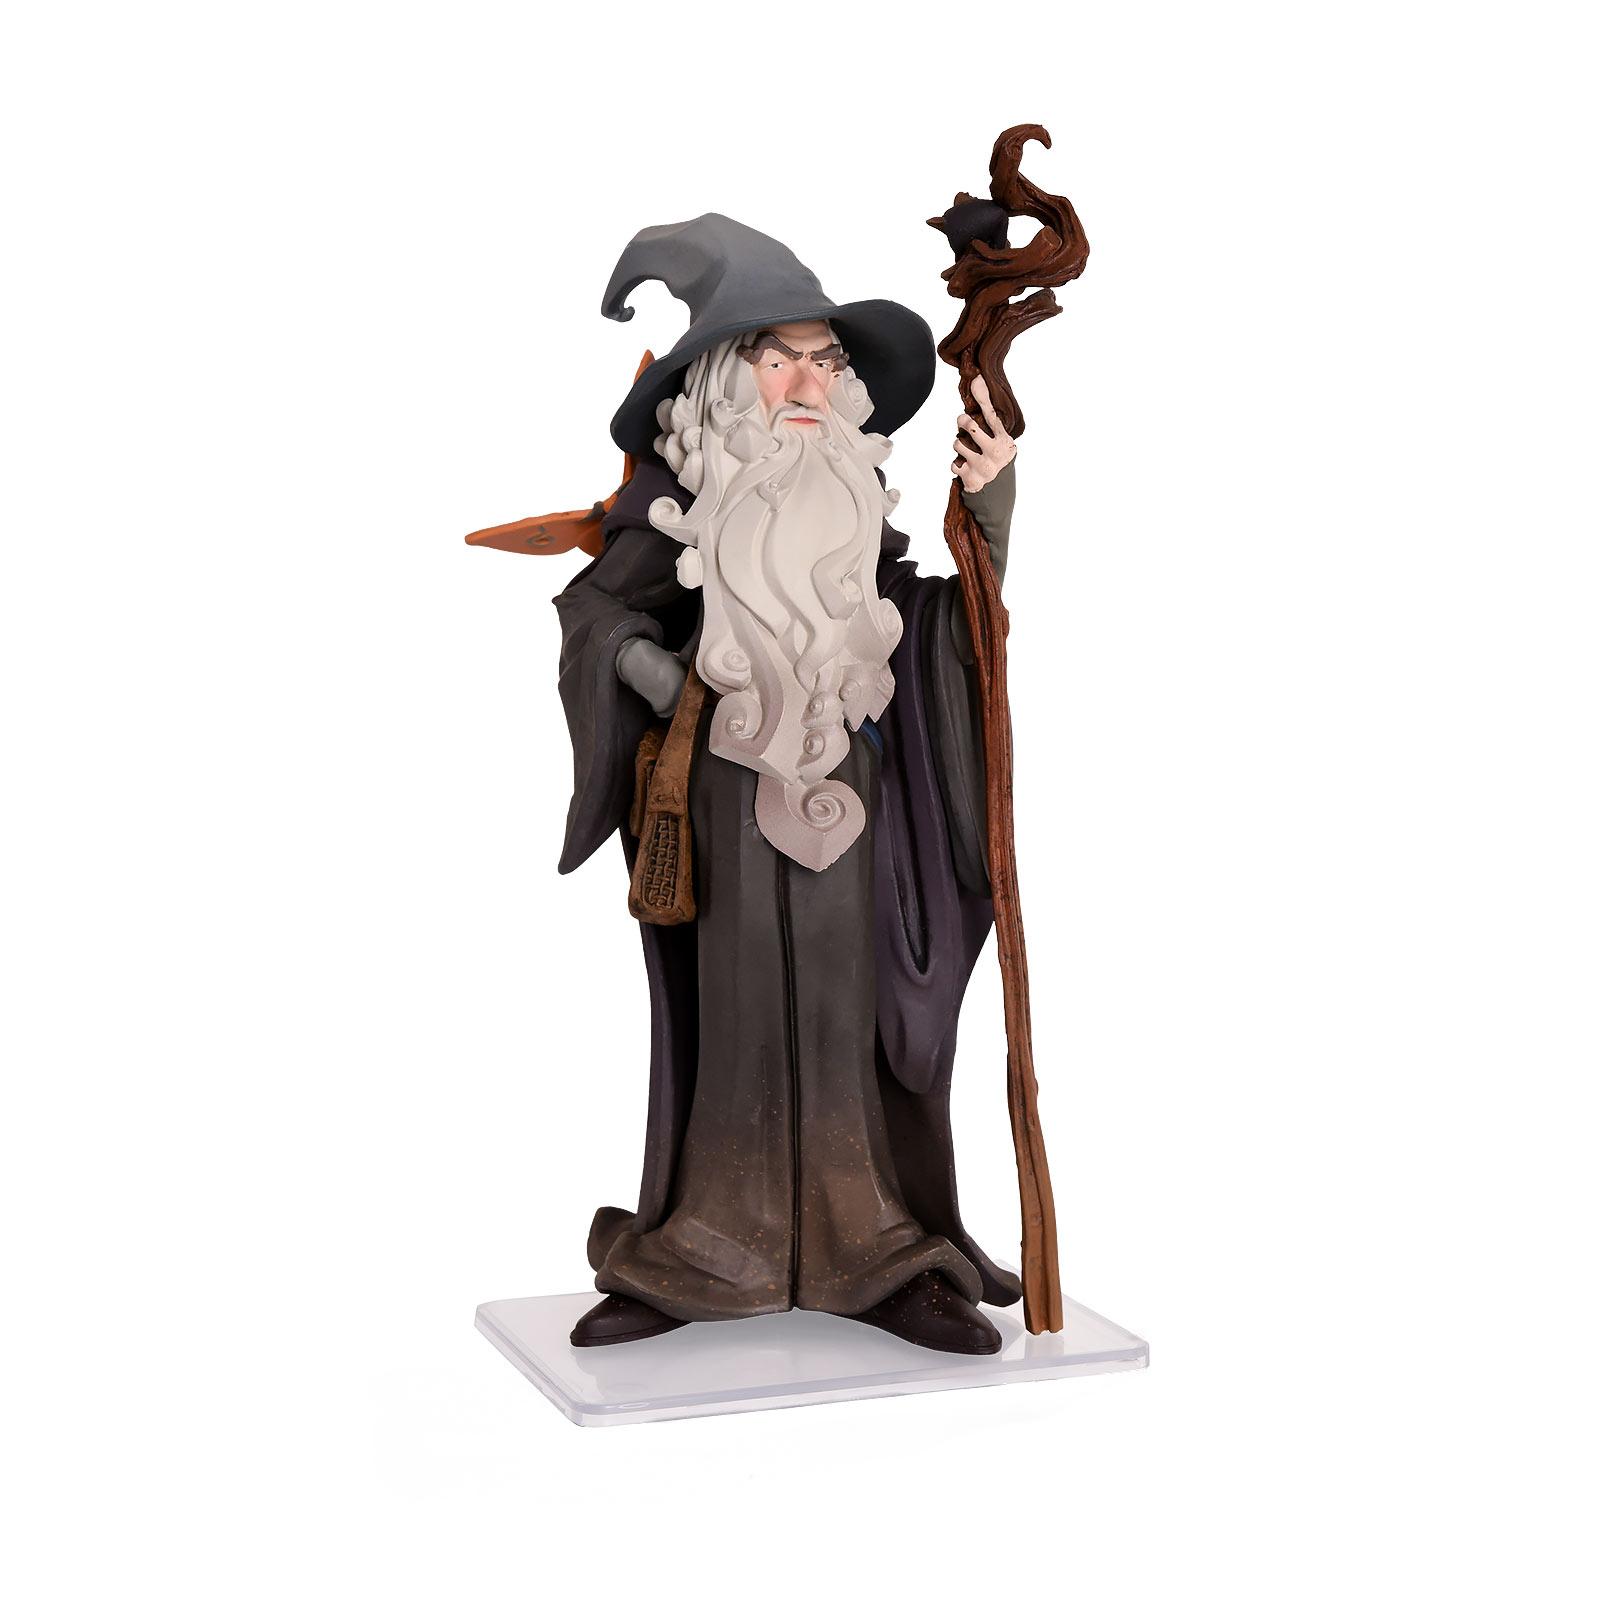 Herr der Ringe - Gandalf Mini Epics Figur